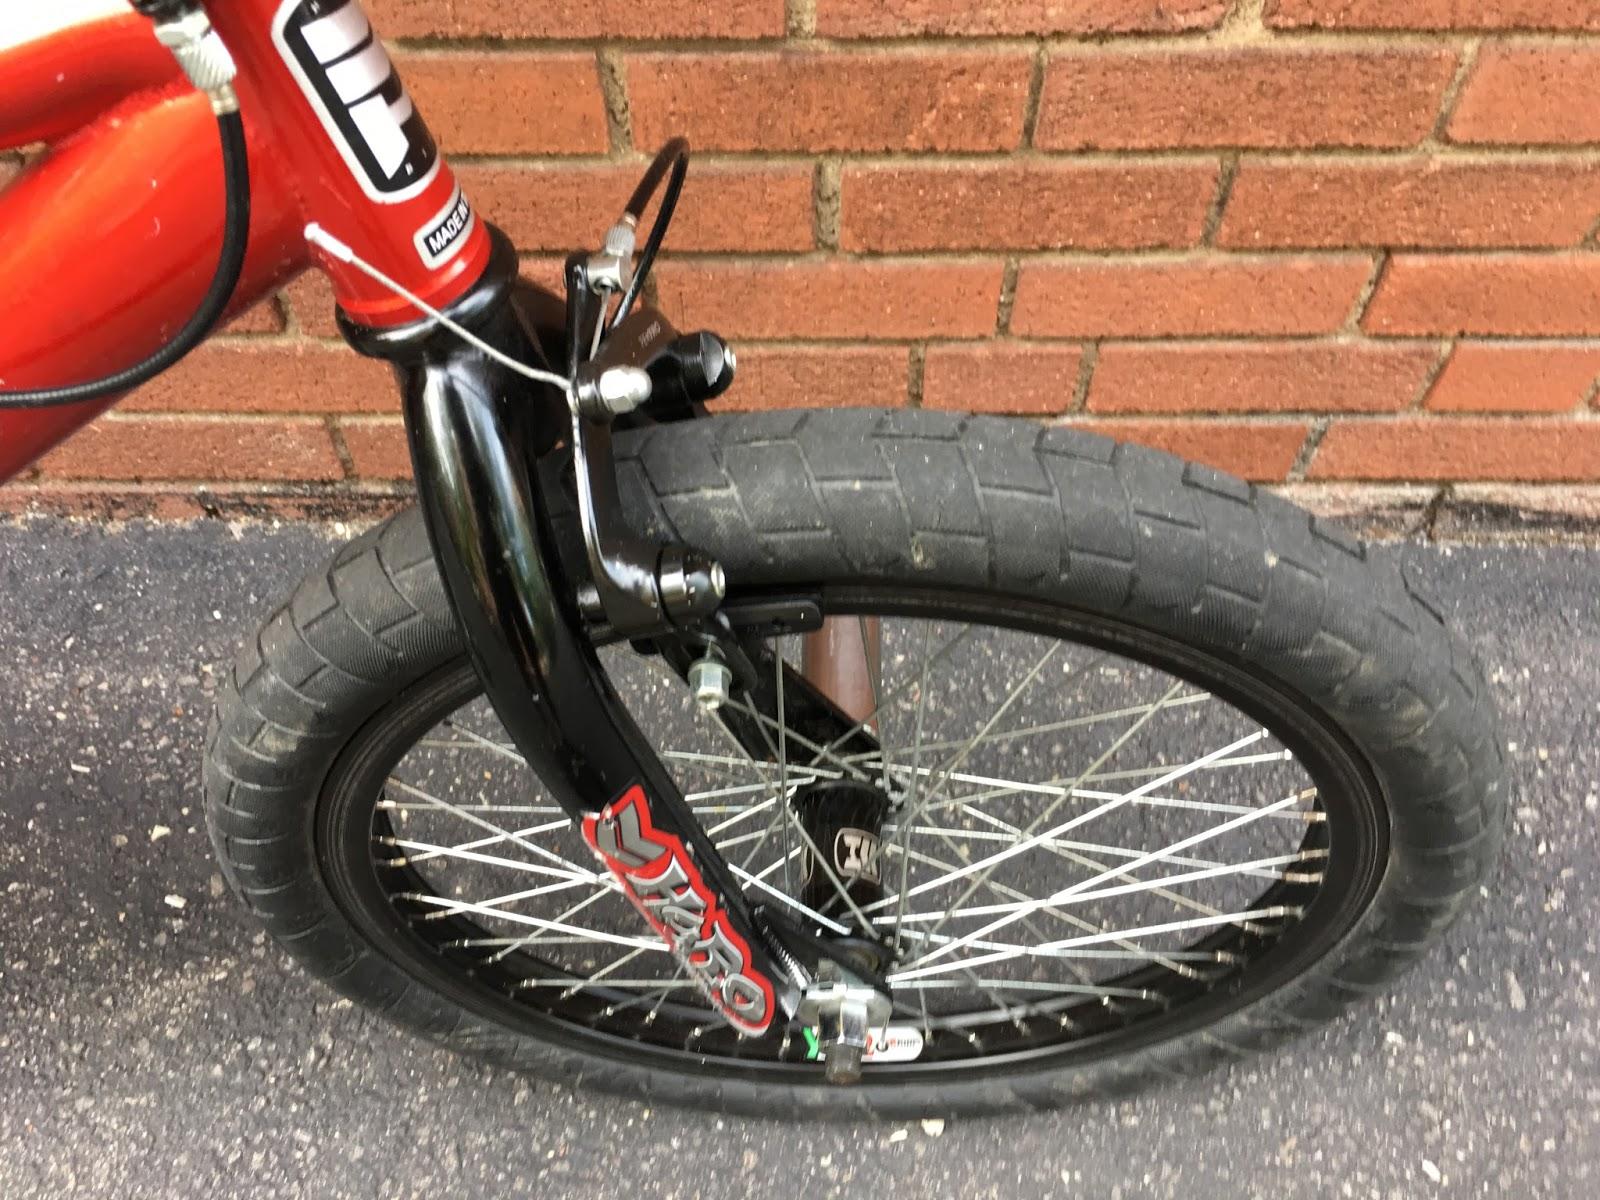 c9862ccc7de 2001 Haro Zippo Freestyle BMX Bike- SOLD | The Whistle Bike Shop